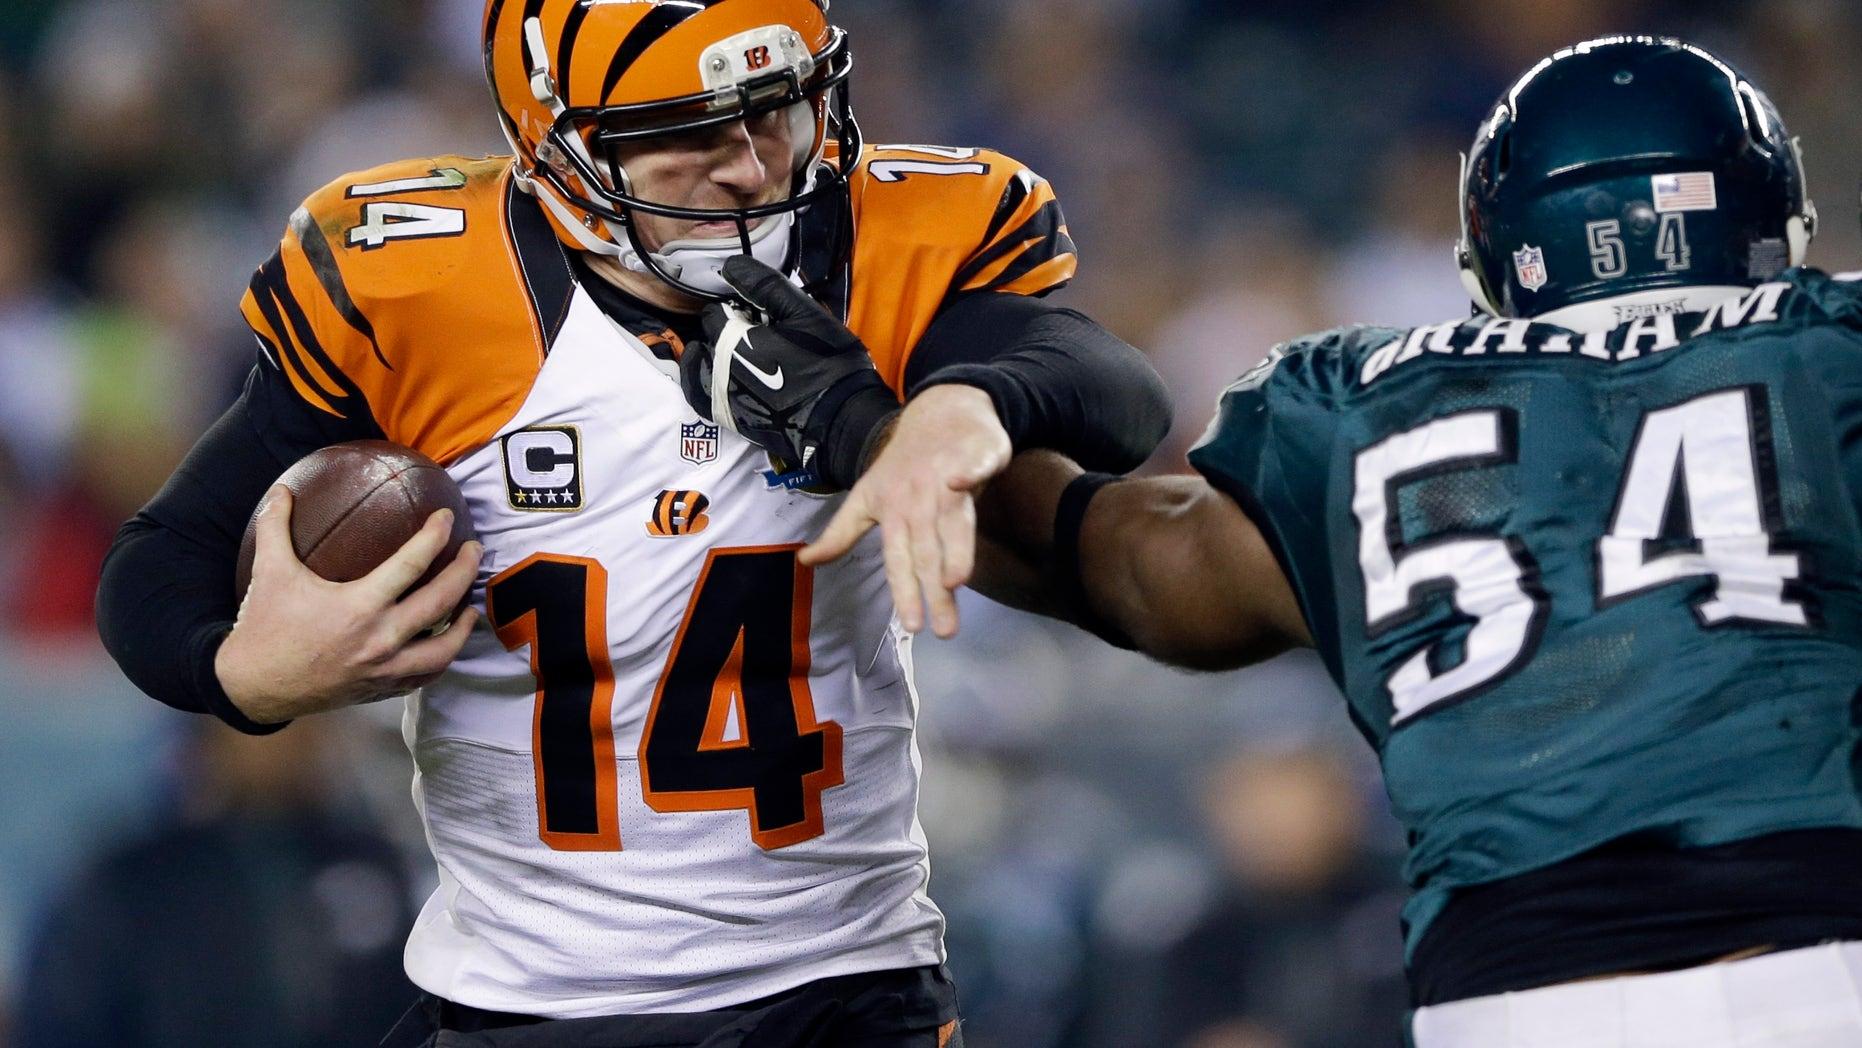 Cincinnati Bengals' Andy Dalton, left, tries to break free from Philadelphia Eagles' Brandon Graham in the second half of an NFL football game, Thursday, Dec. 13, 2012, in Philadelphia. (AP Photo/Matt Rourke)